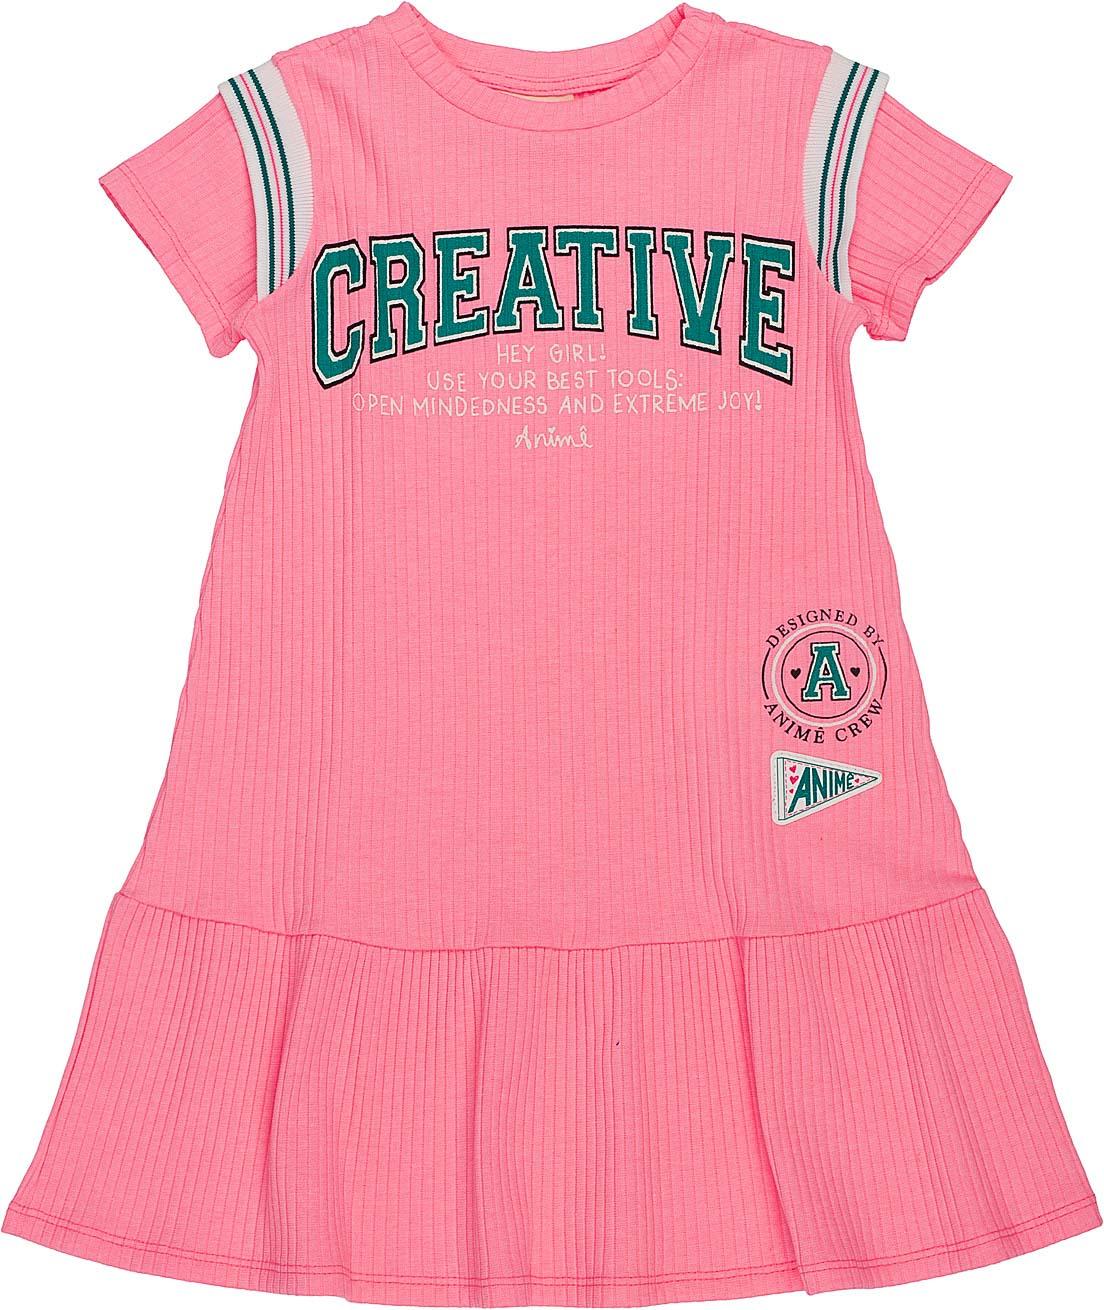 Vestido Creative Animê Petite